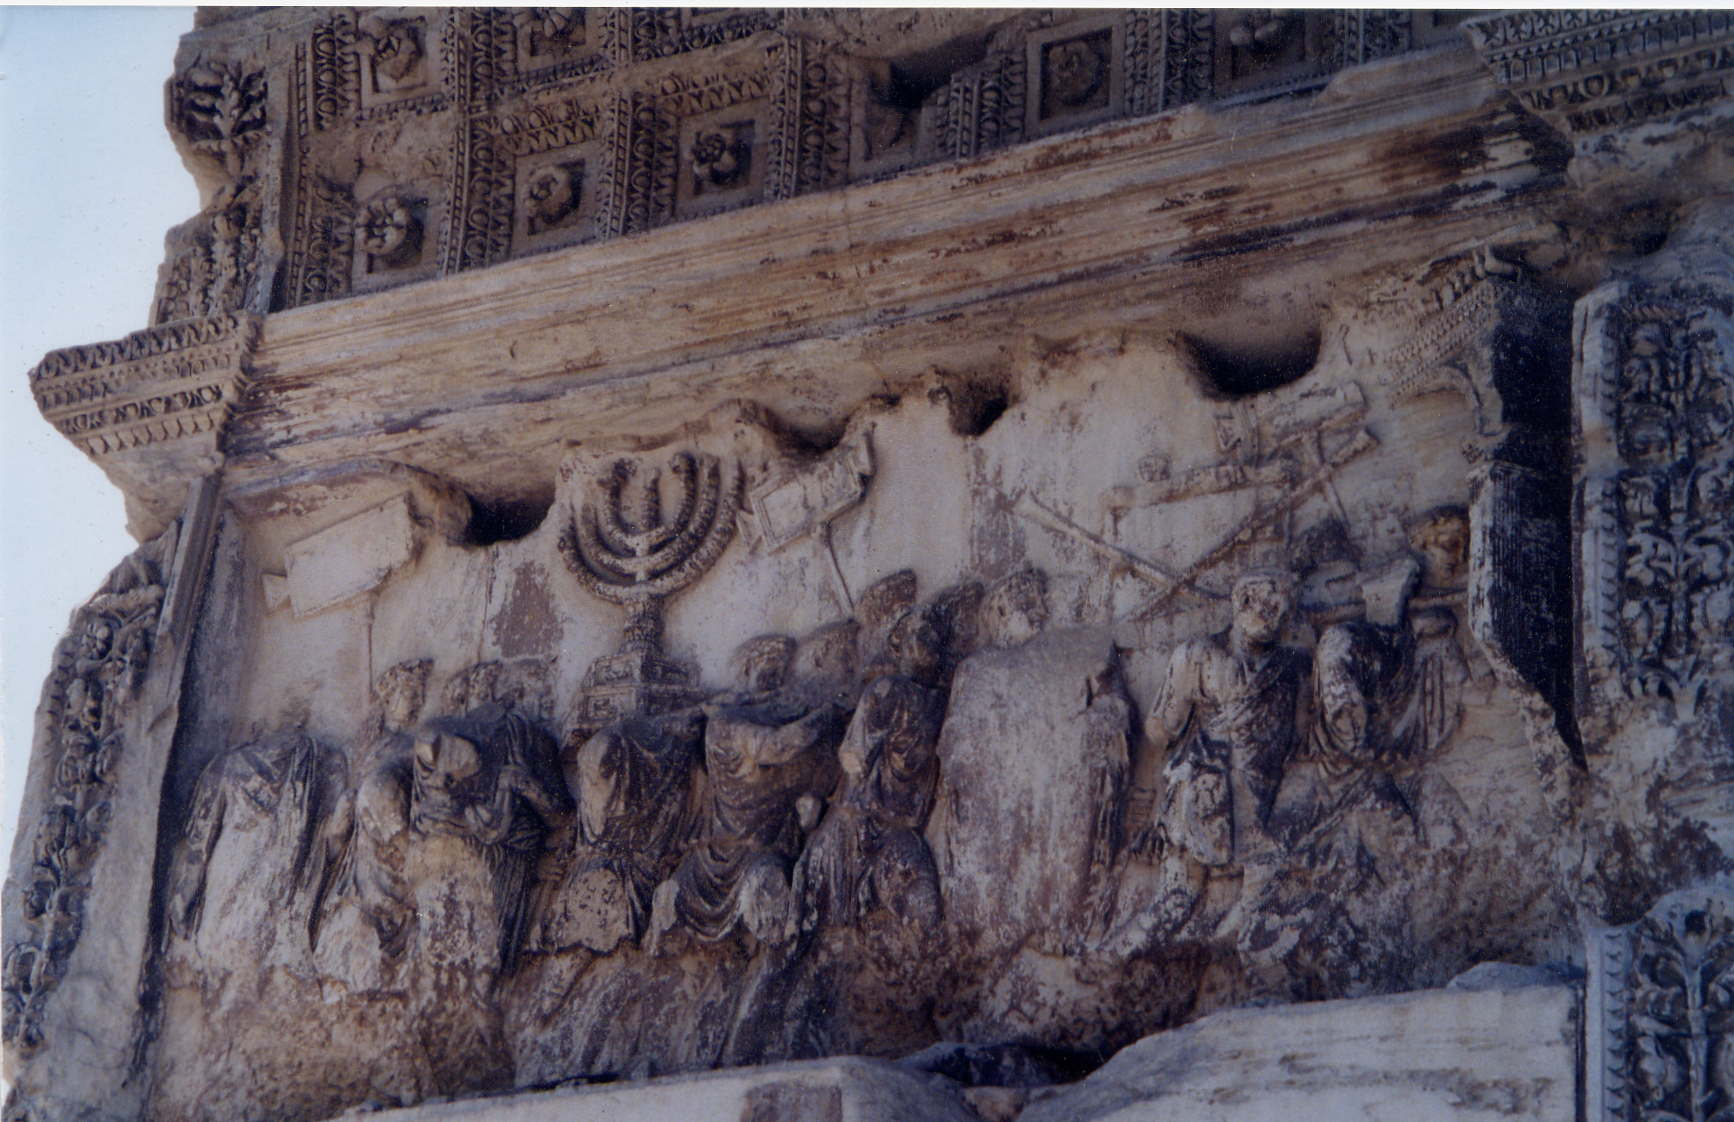 http://upload.wikimedia.org/wikipedia/commons/7/7b/Titus_Jerusalem.jpg